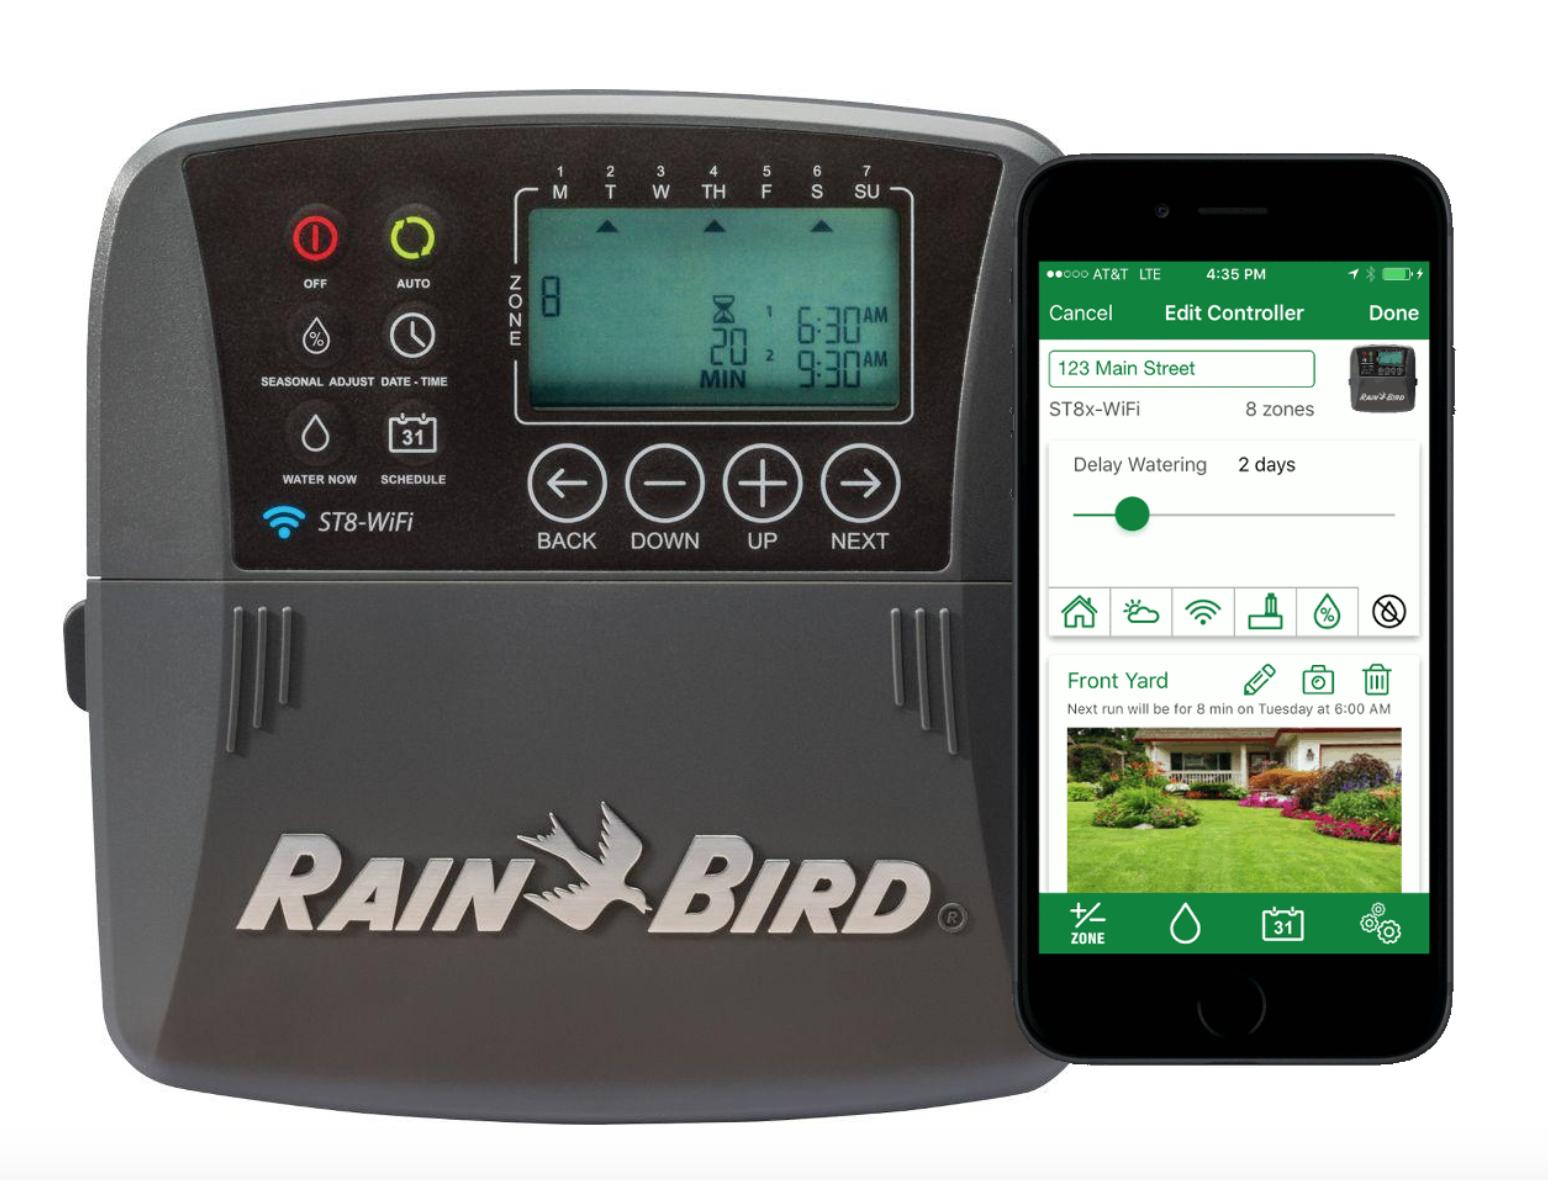 http://blueskyrain.com/wp-content/uploads/2019/04/RainBird-ST8-WiFi-Sprinkler-Controller-BlueSkyRain.com_.png